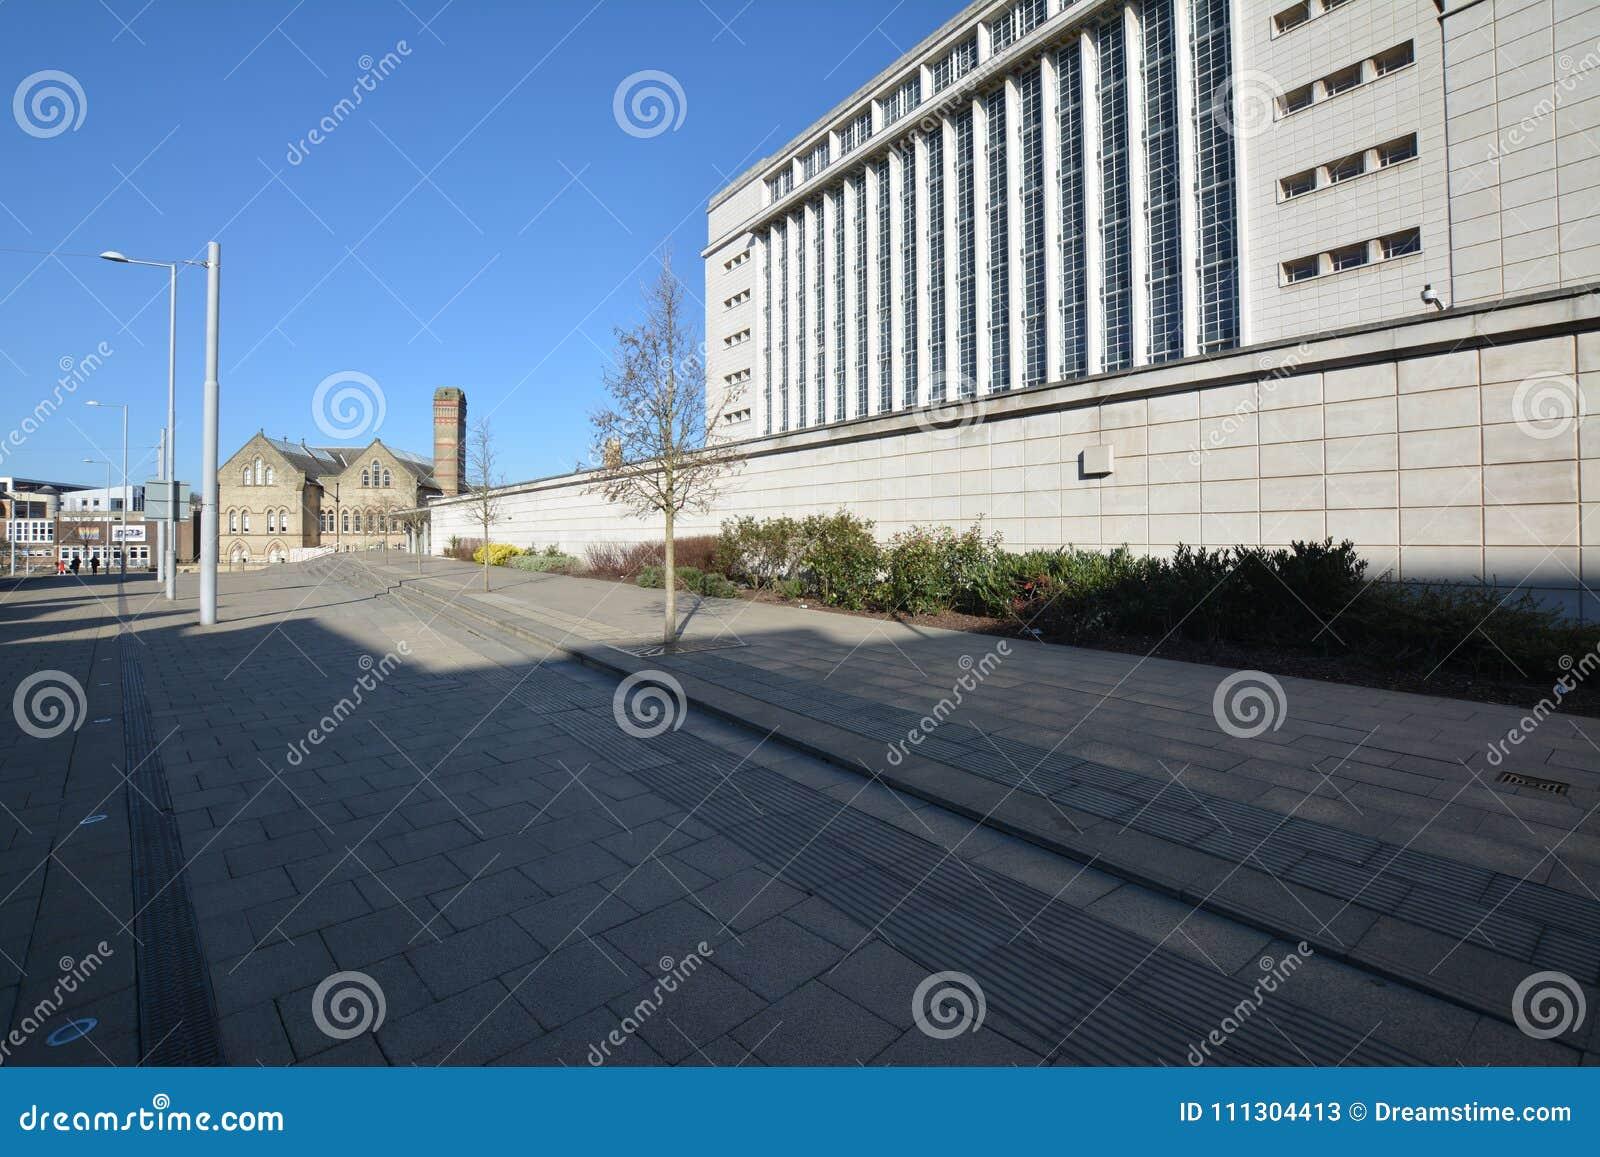 Université Nottingham en Angleterre - Europe